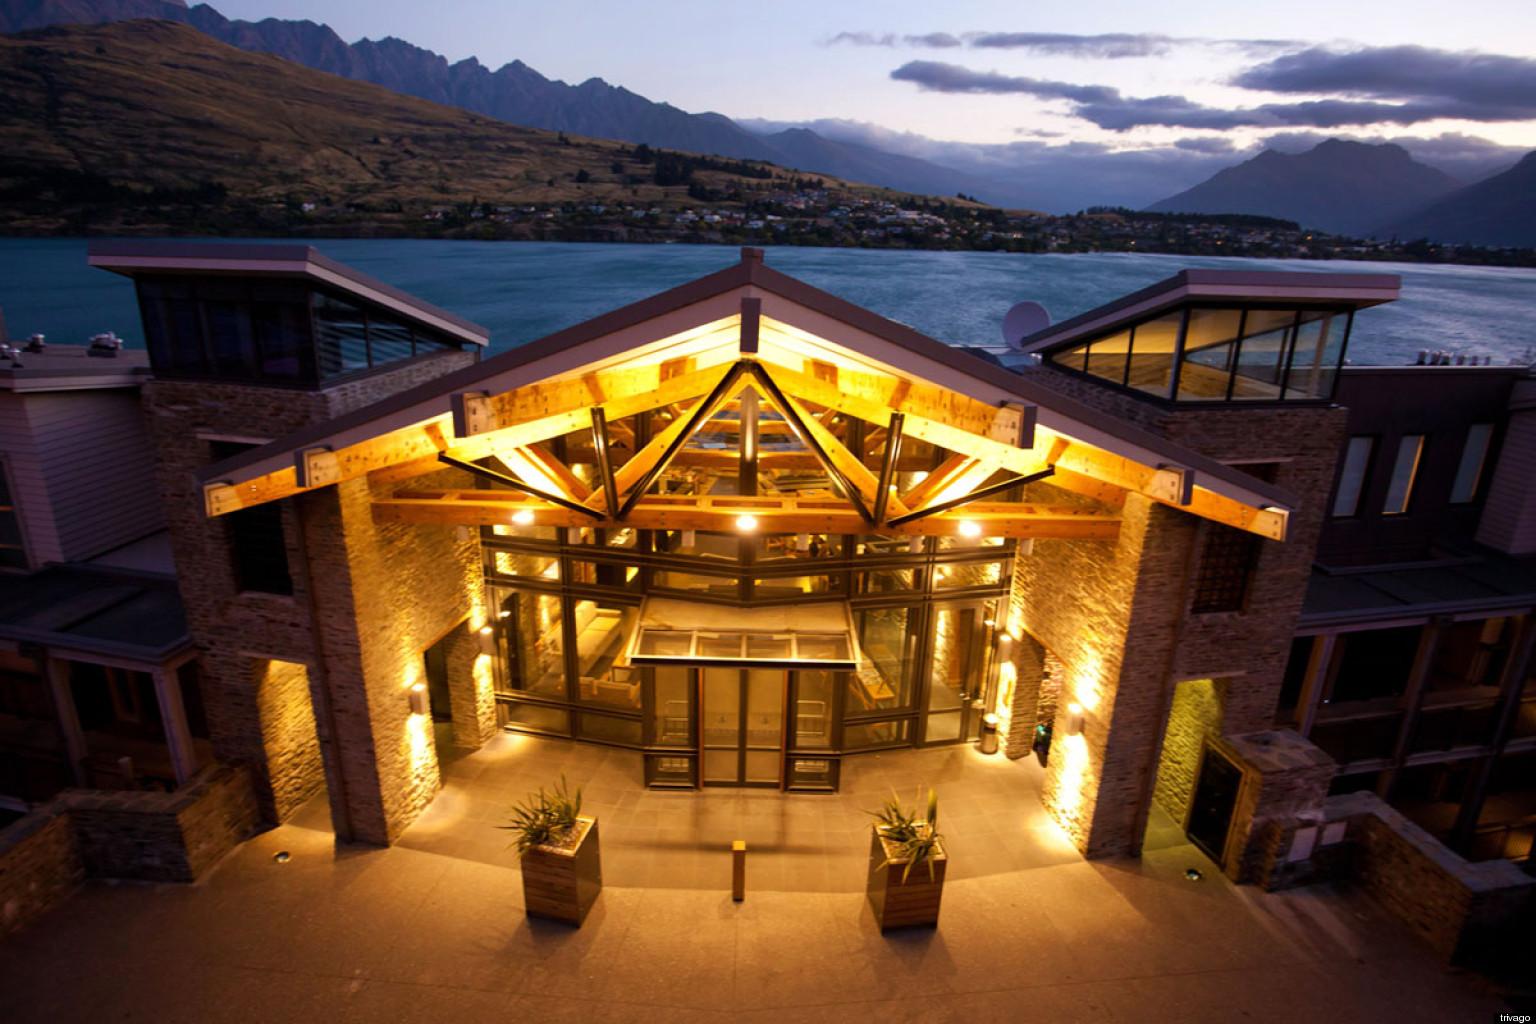 When Peter Jackson's production crew left Matamata, New Zealand, they left  17 hobbit holes